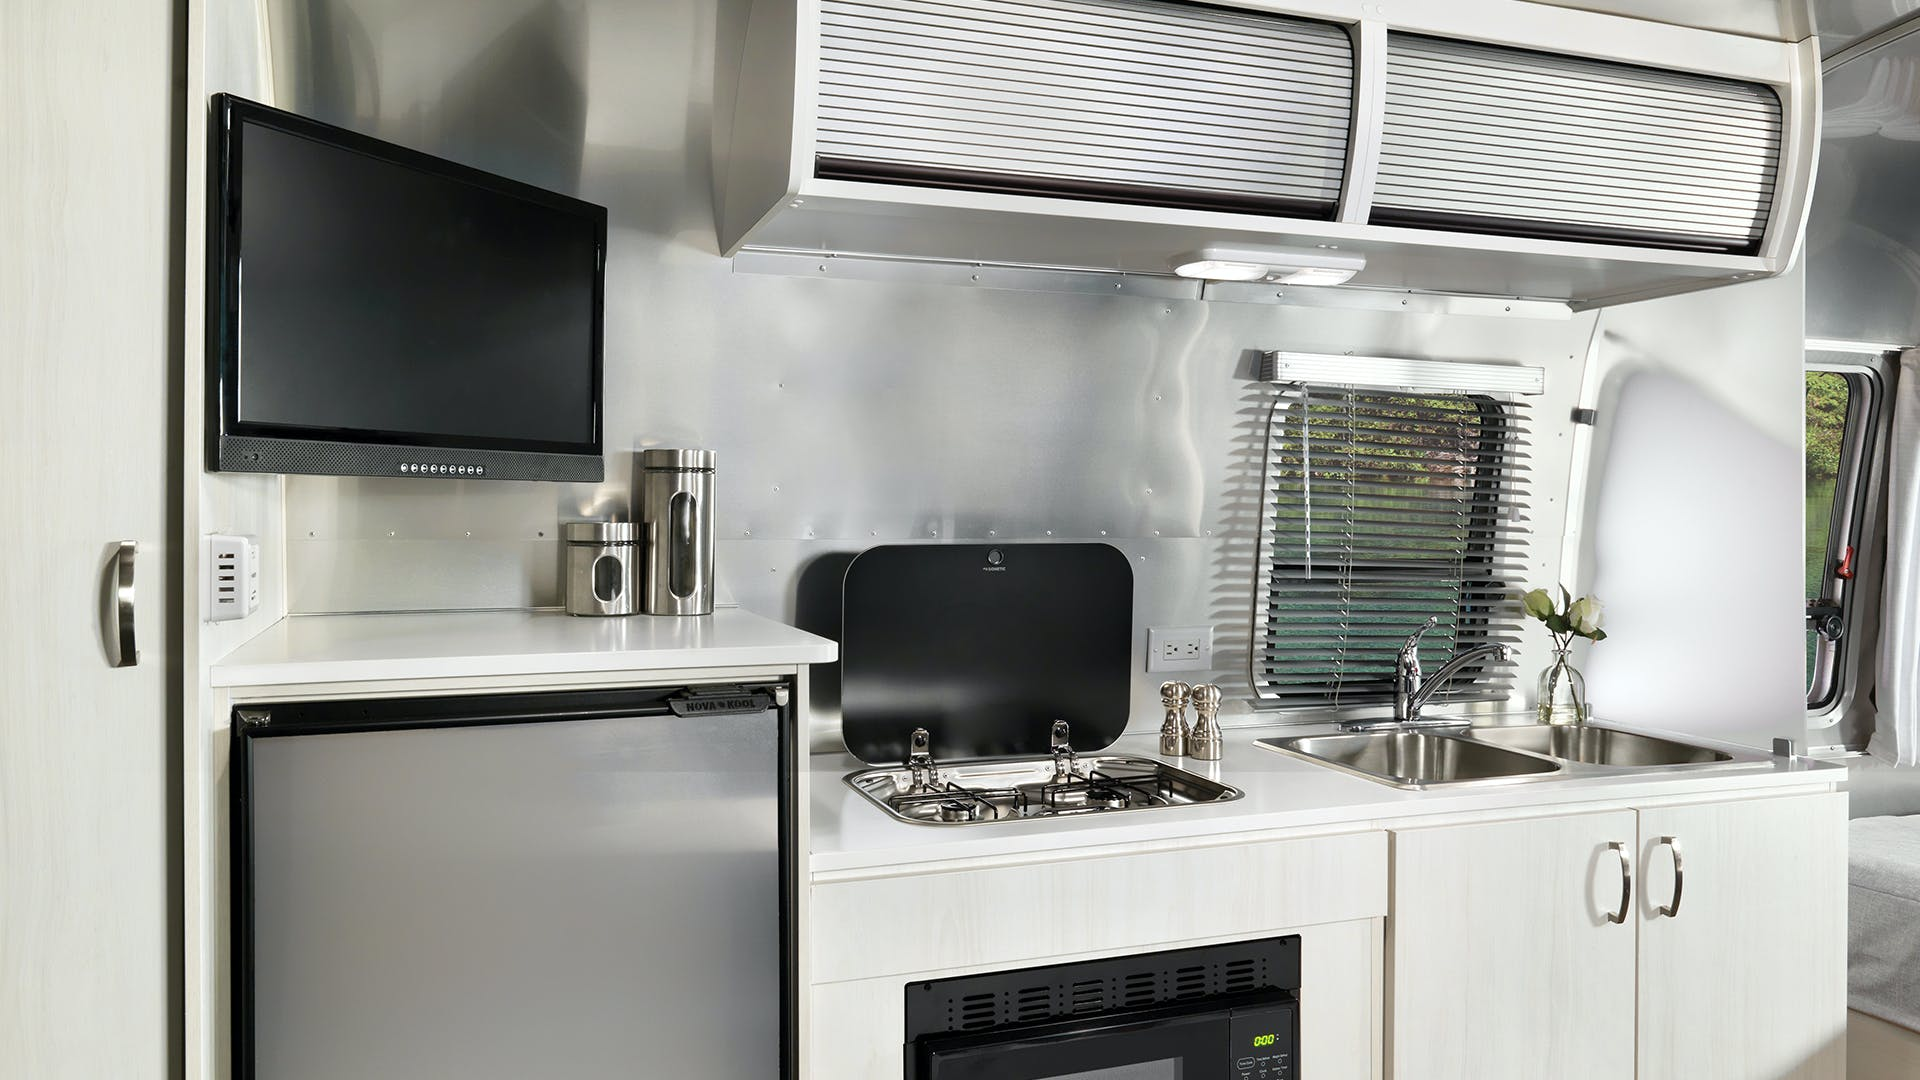 2020 Airstream Bambi Interior Kitchen Galley Stove Refrigerator